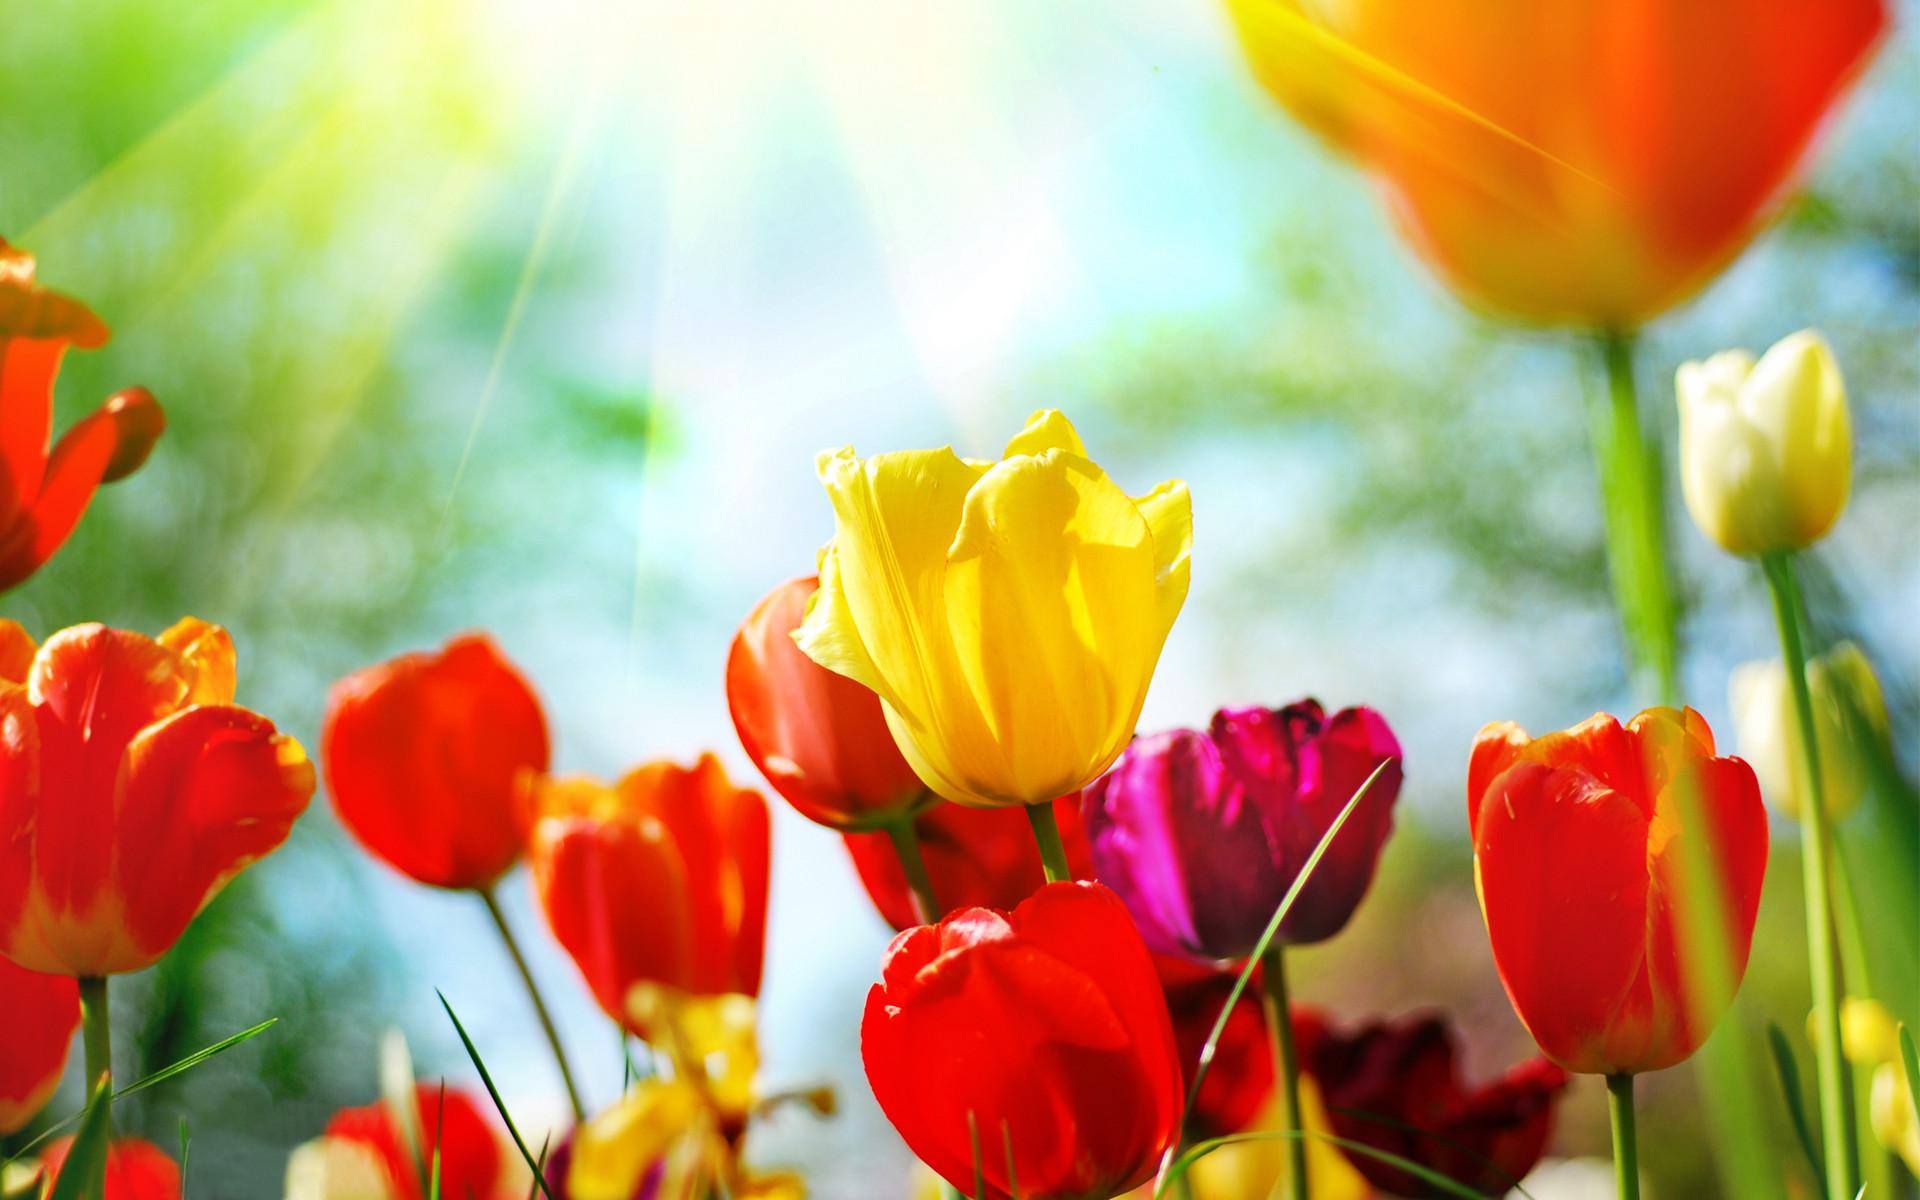 Spring flower desktop background spring flowers hd desktop background 1920x1080 spring flowers hd desktop background download mightylinksfo